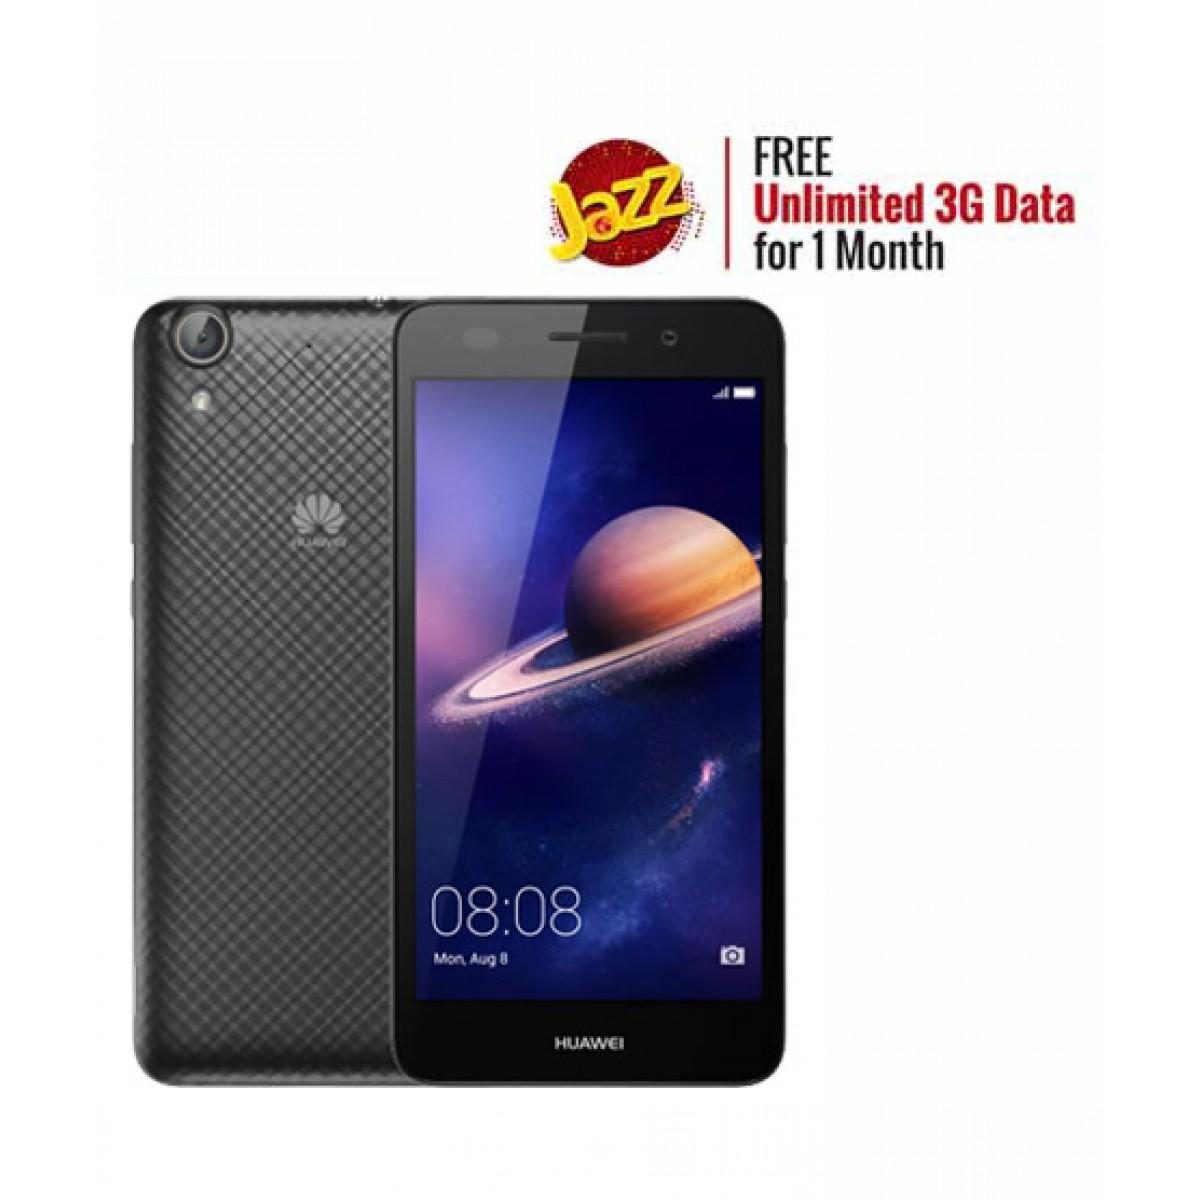 Huawei Y6 II 4G 16GB Black